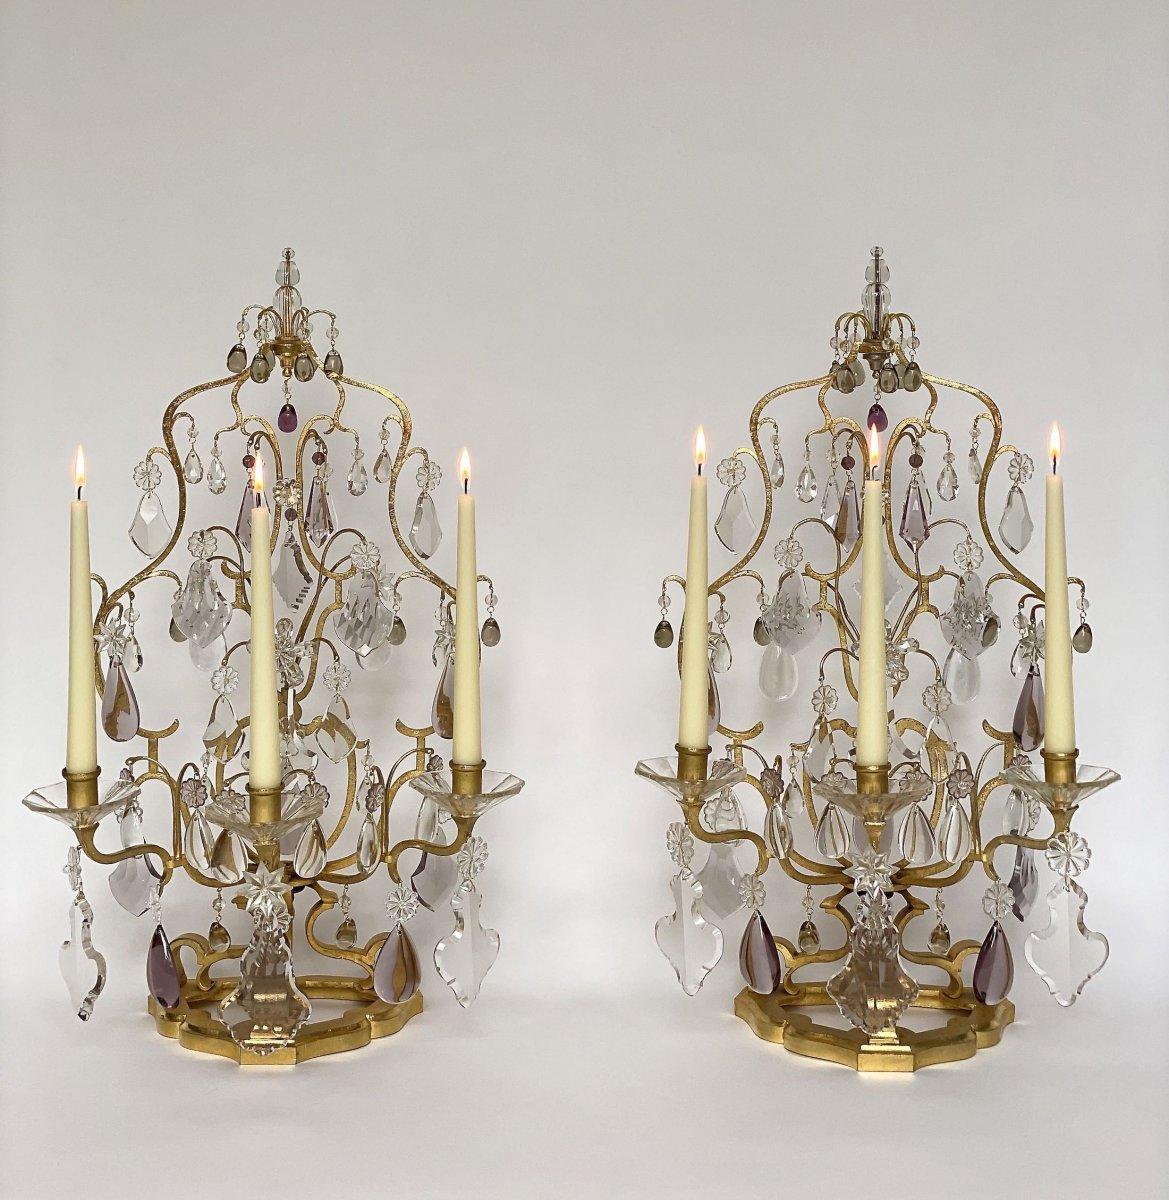 A  Pair Large Crystal Girandoles By Maison Baguès